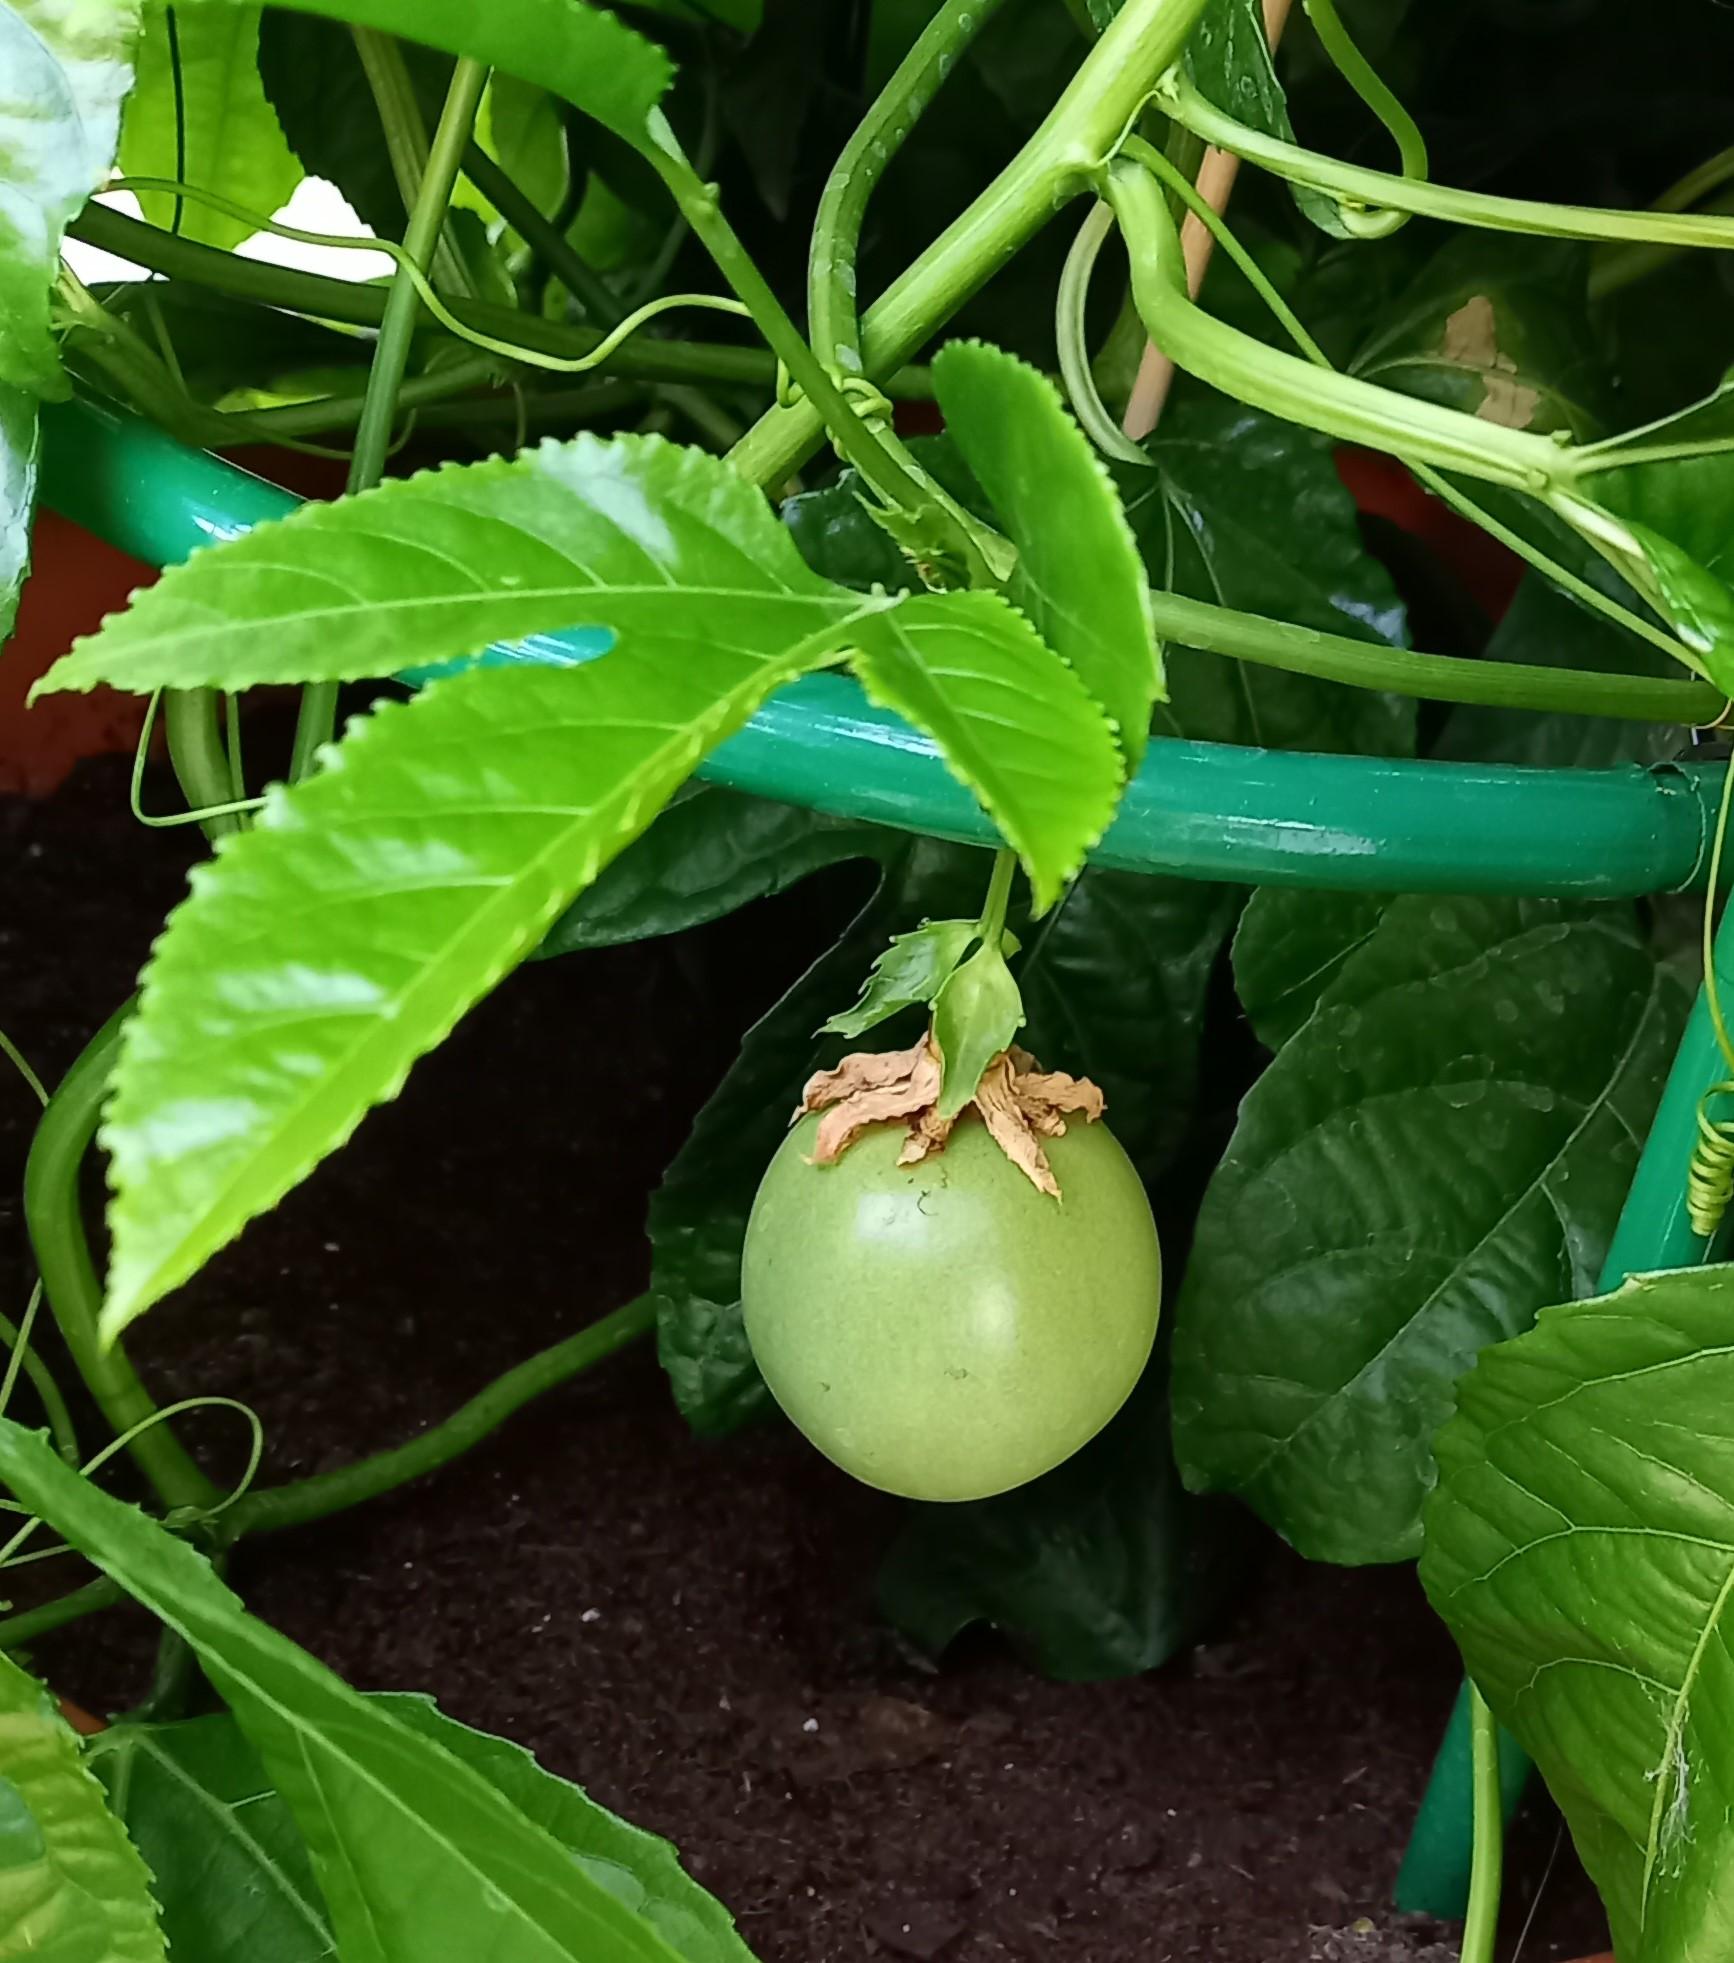 Maracuja - Passionsfrucht (Passiflora edulis) 'Suntropics®' T17, rankend